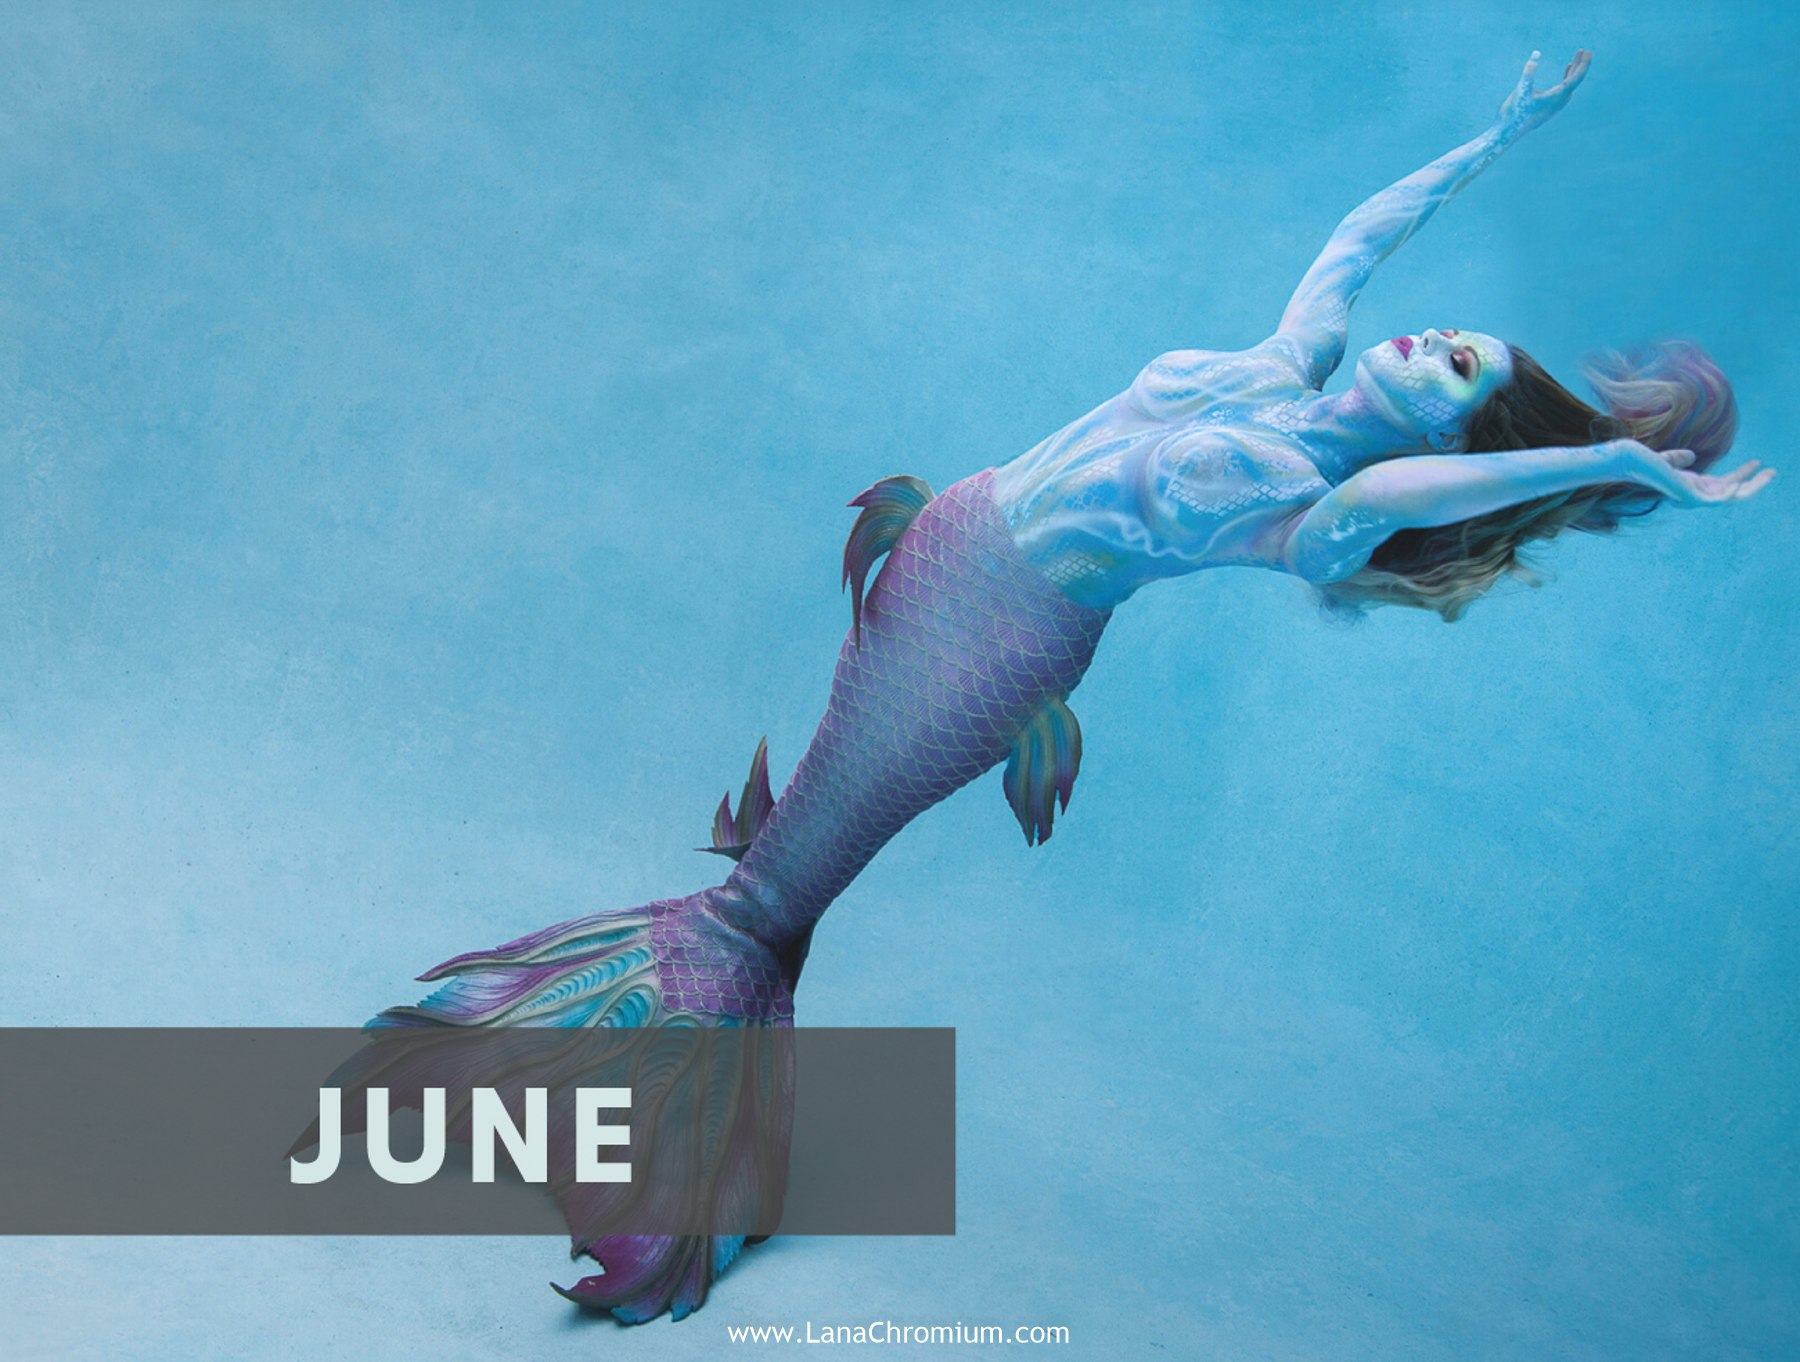 2020 Bodyart Calendar Bodypainting And Fine Art By Lana Chromium